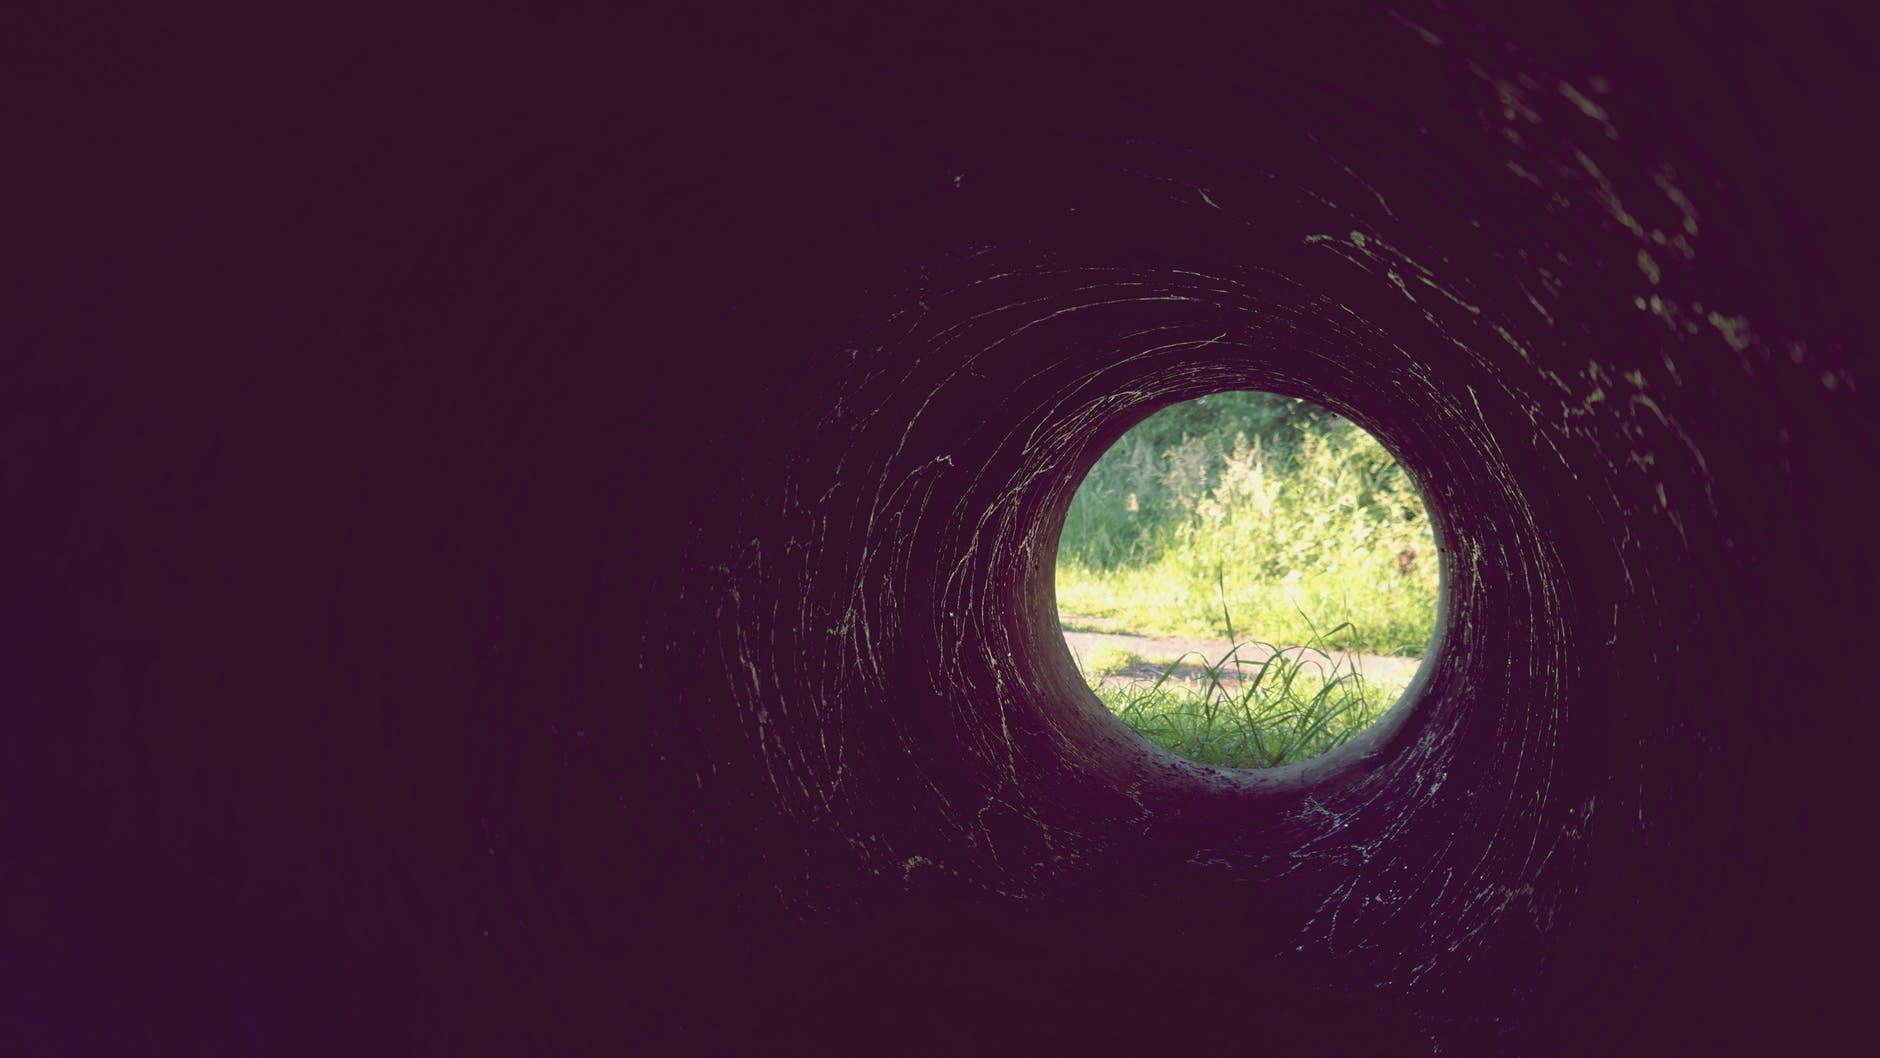 ball shaped dark grass hole